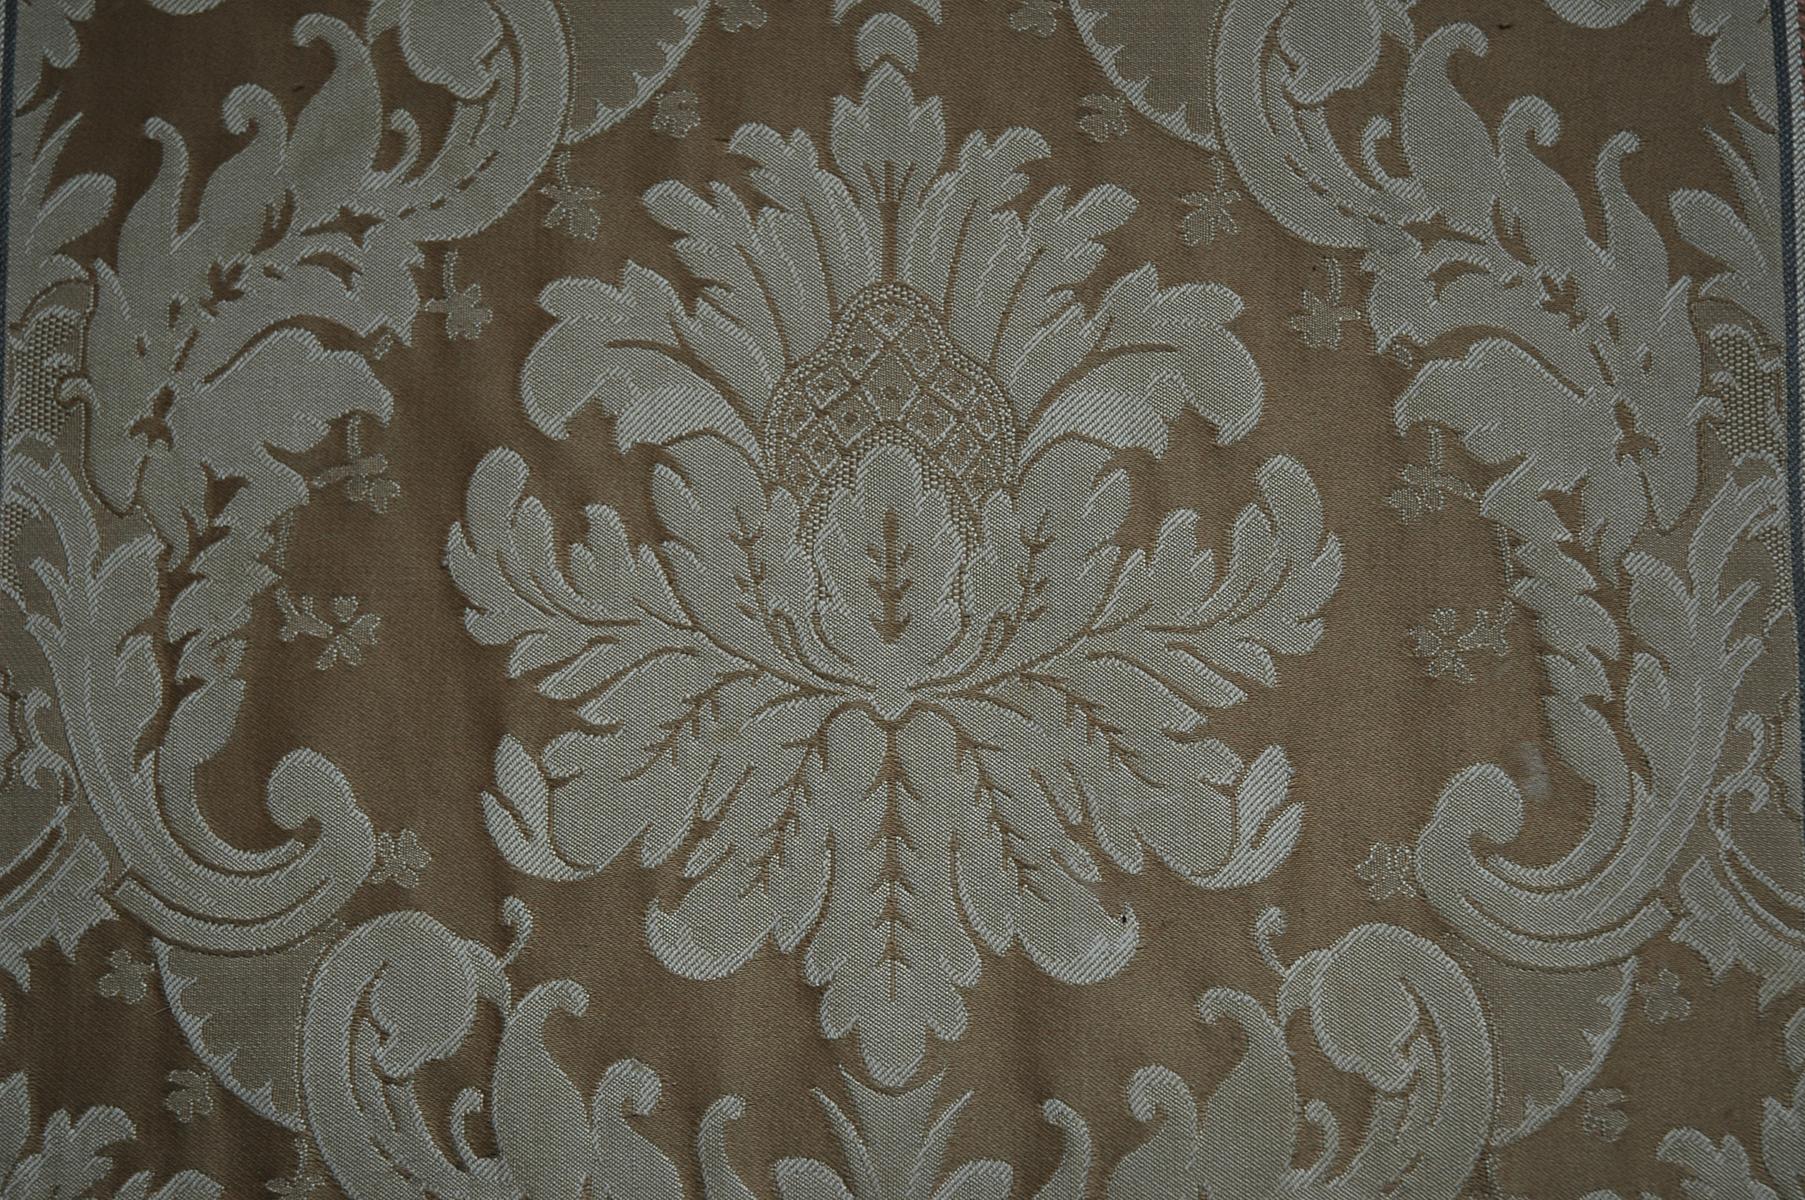 Free Dsc 5799 Textures From Textureking